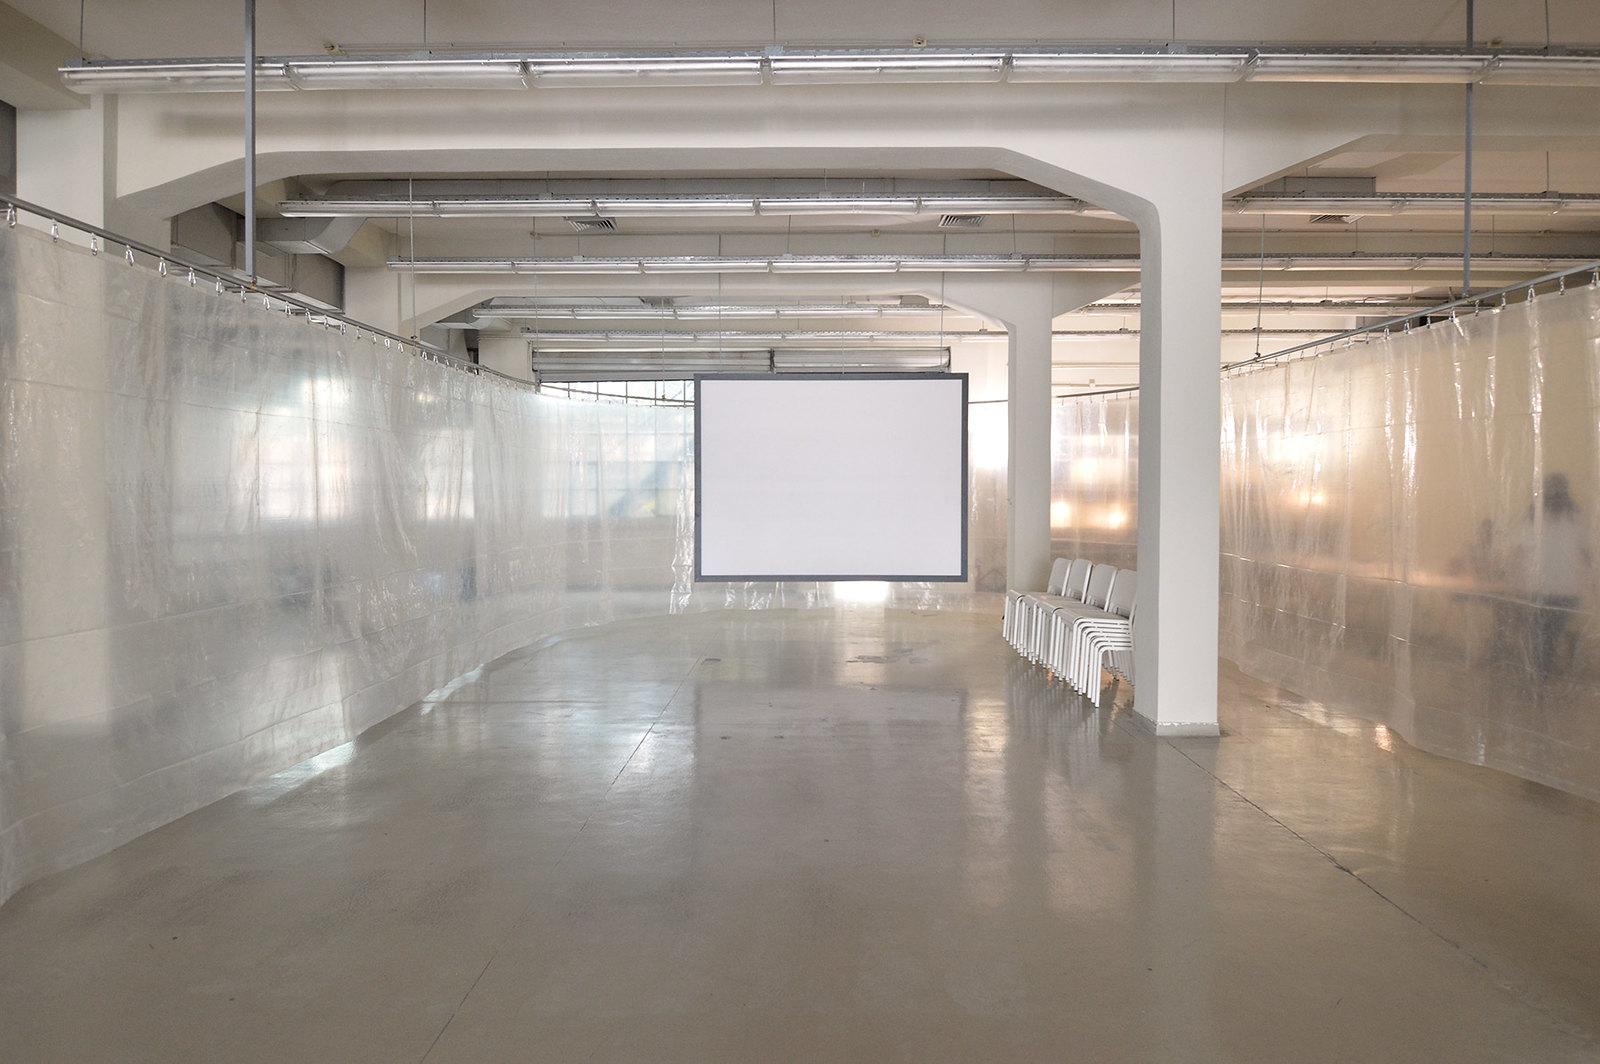 Translucent Cinema